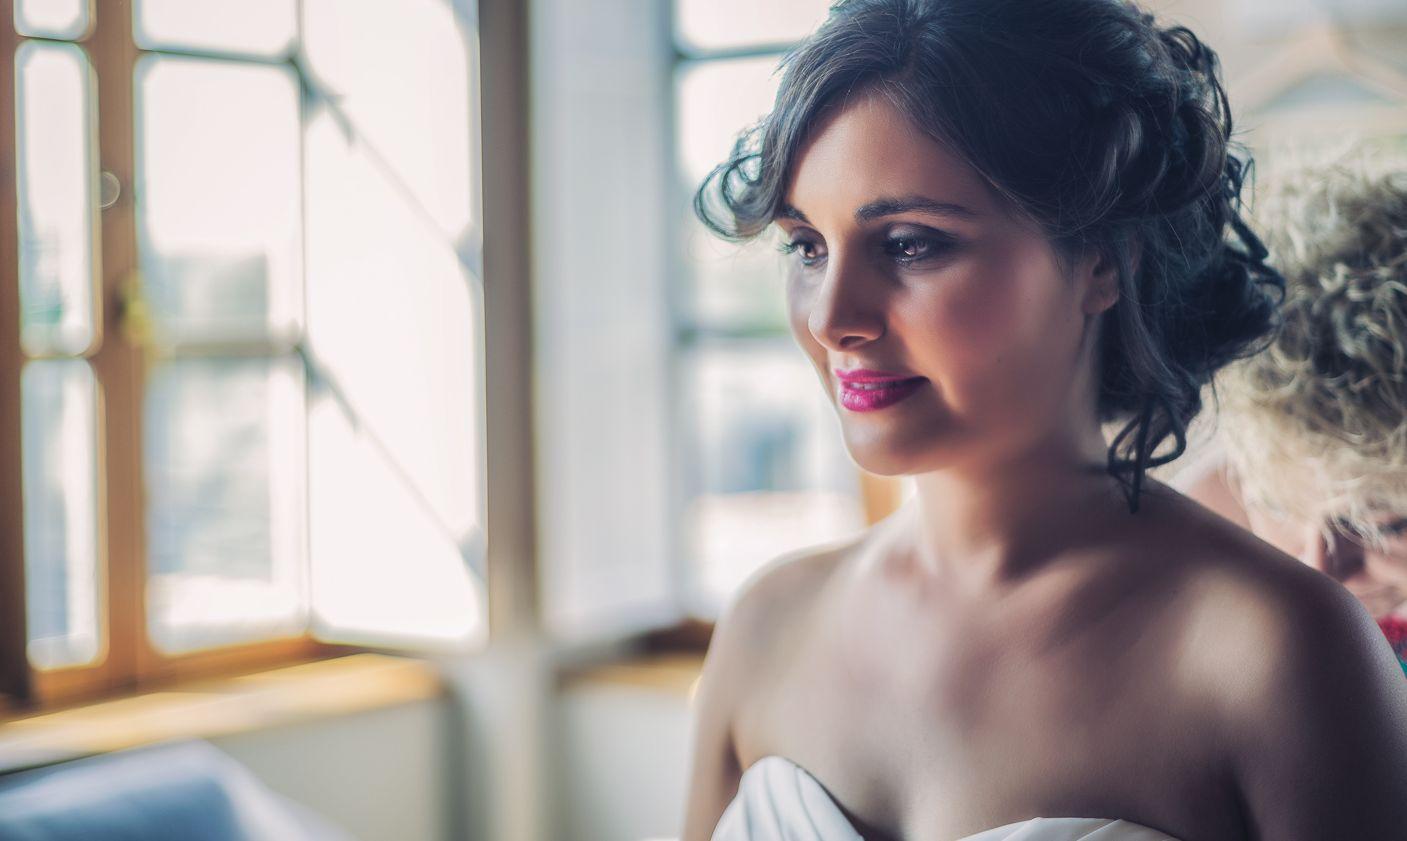 Fotografía de bodas diferente